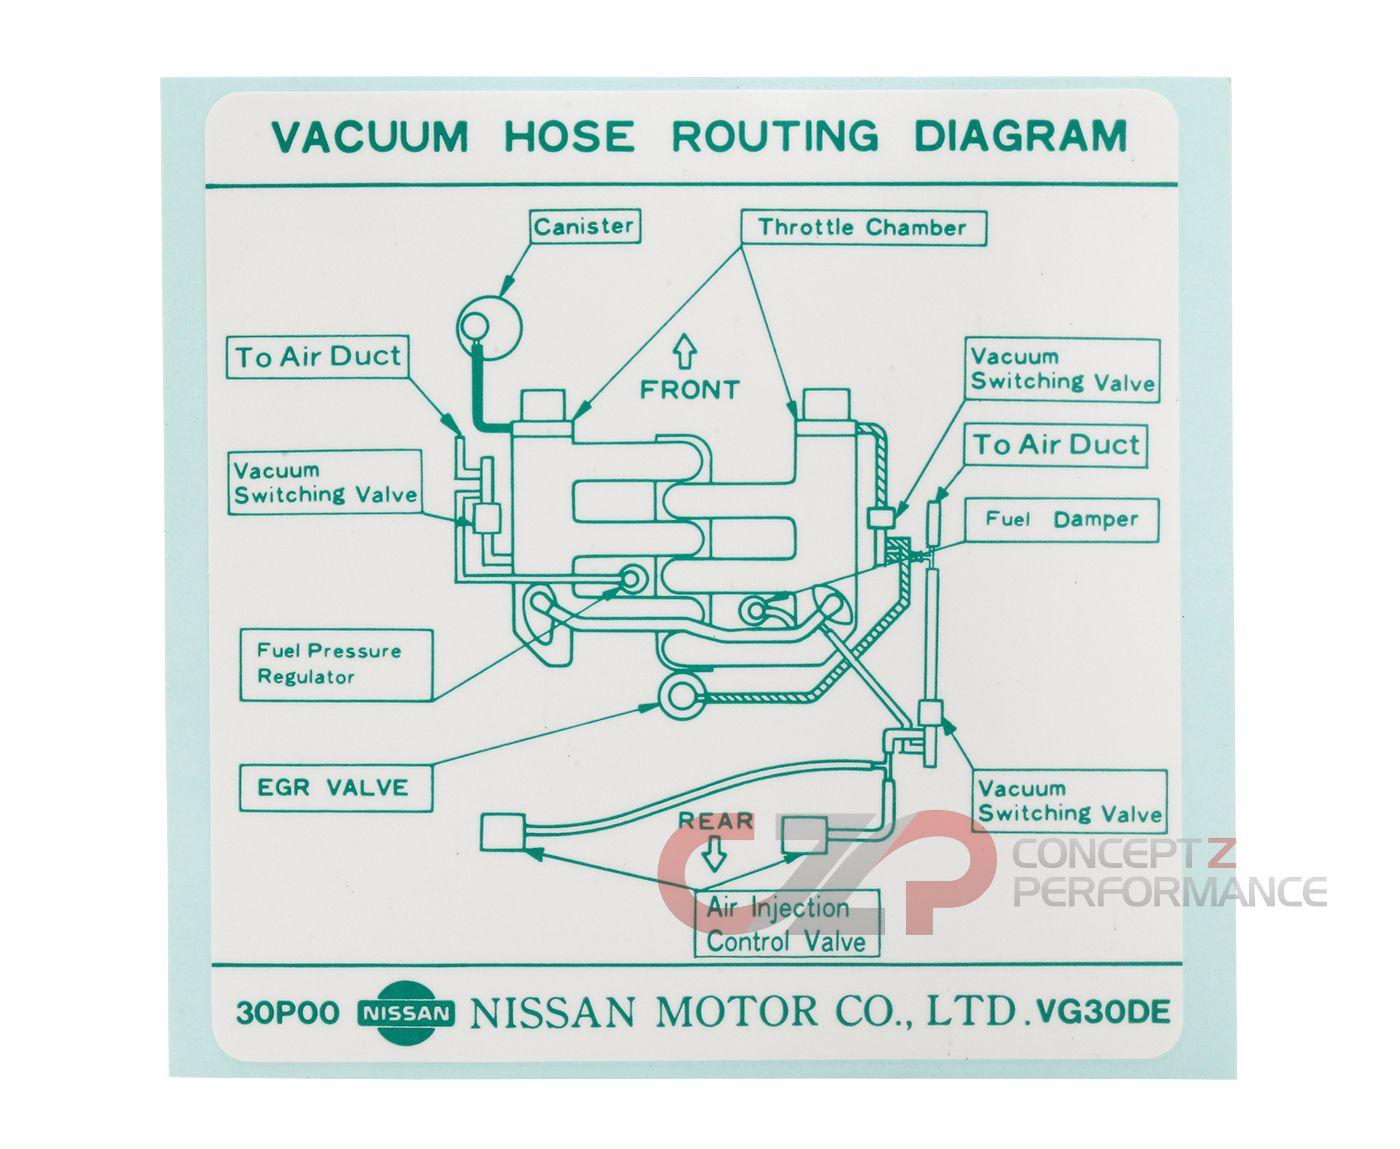 hight resolution of nissan infiniti label vacuum piping diagram 22304 30p00 universalinfiniti vacuum diagram 8